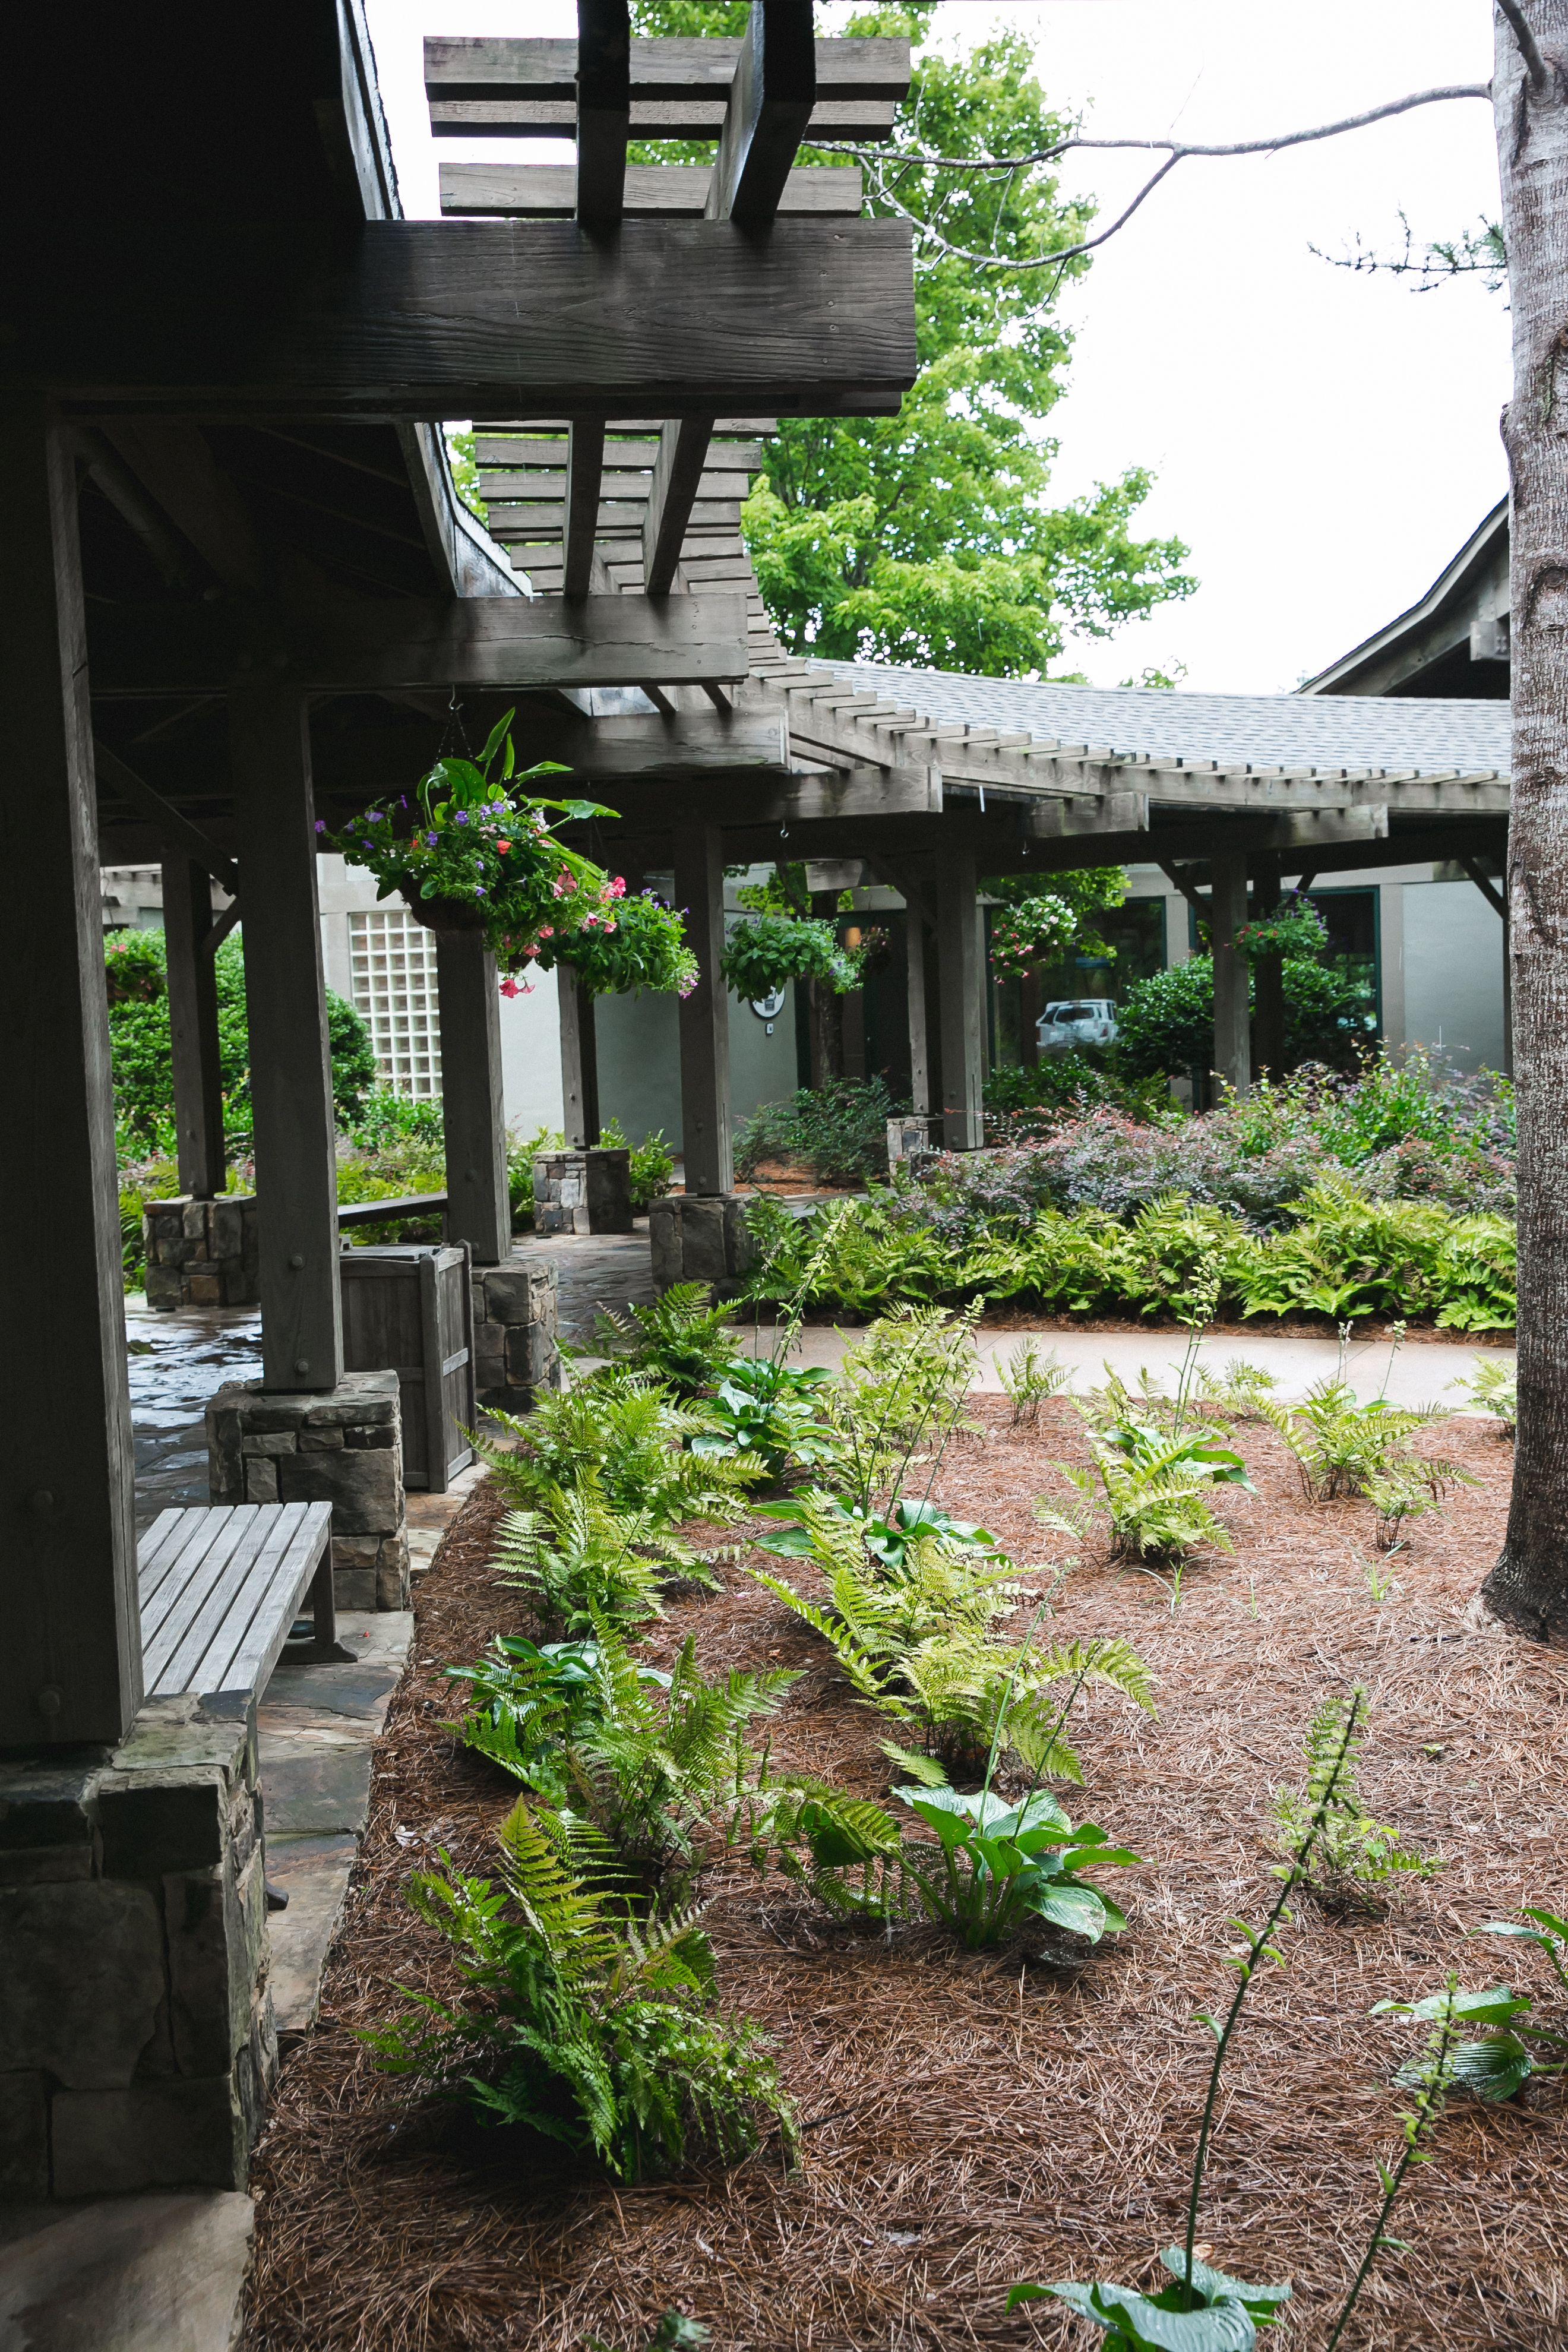 The Lodge And Spa At Callaway Resort & Gardens